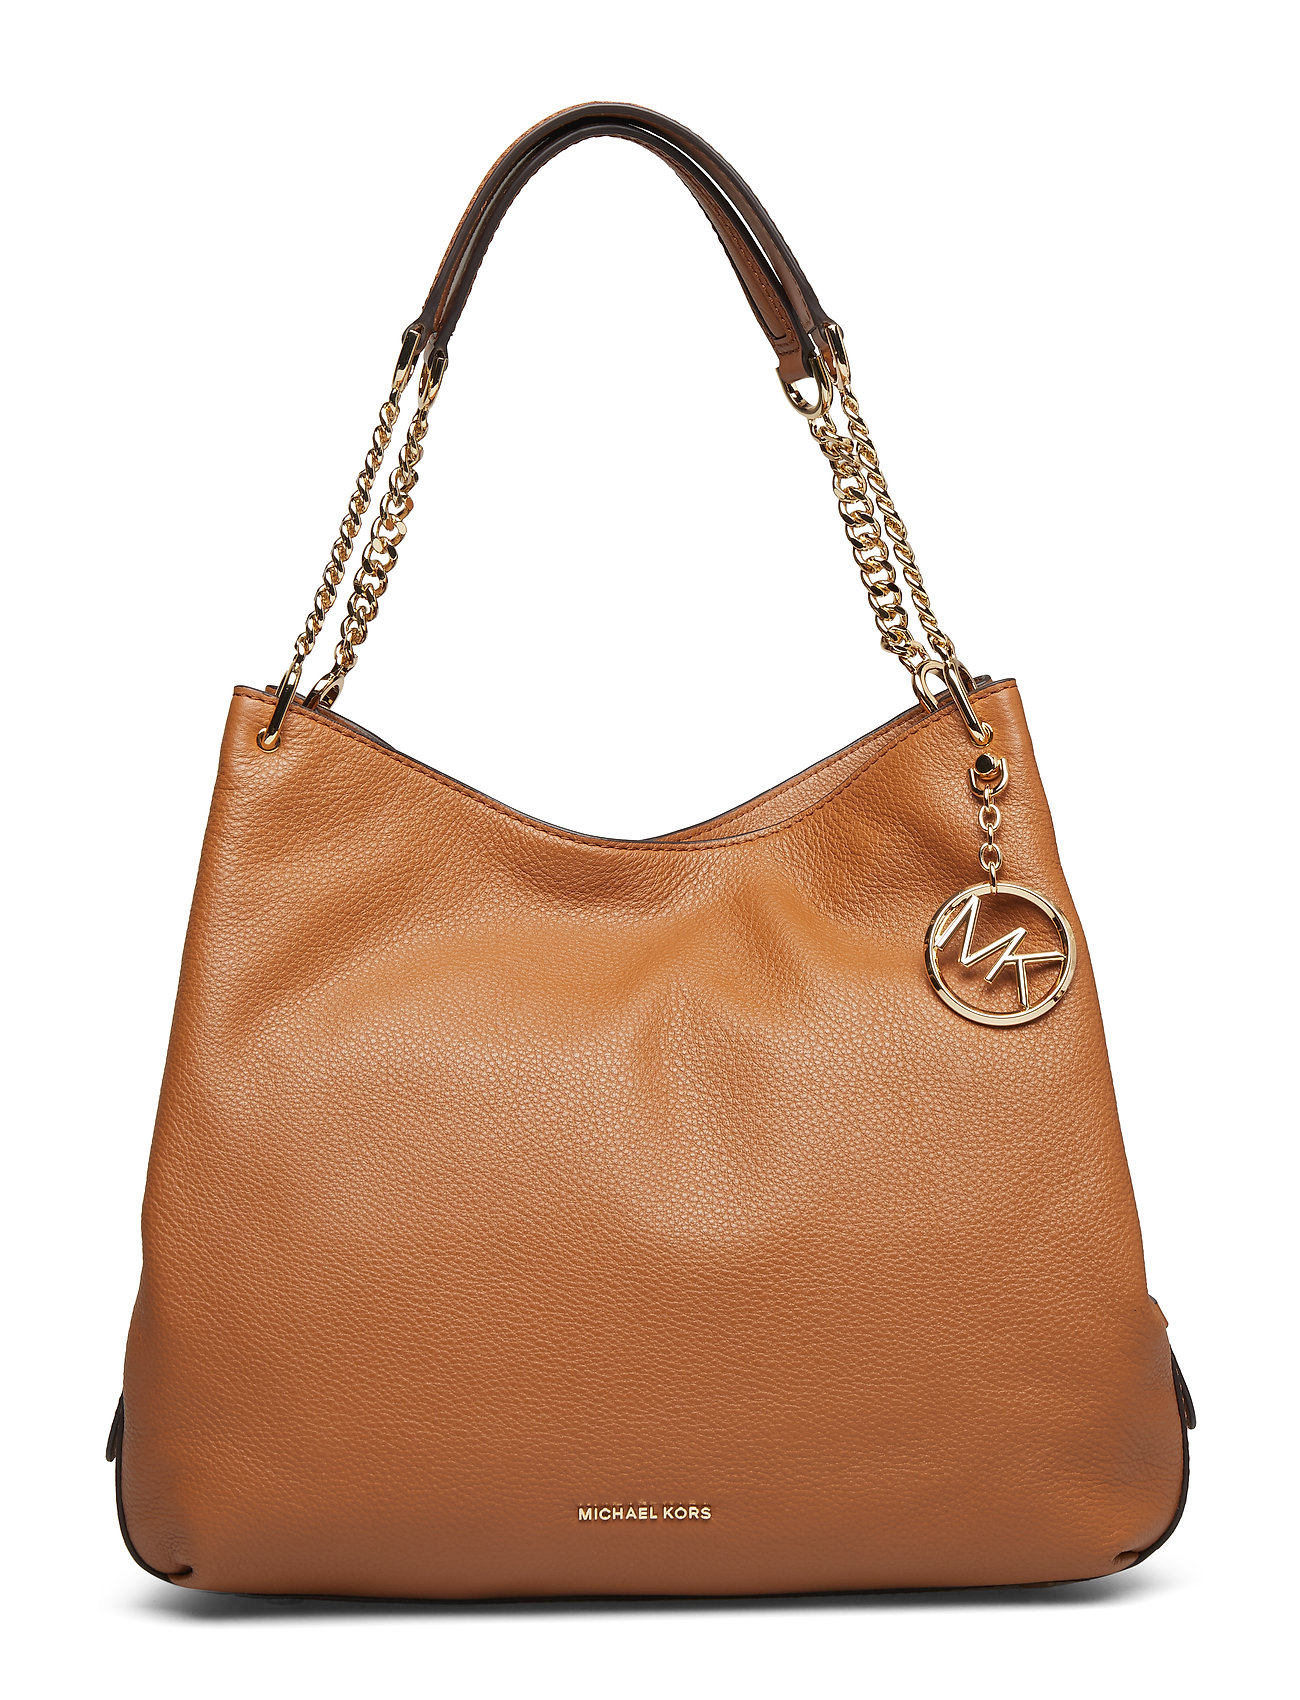 MICHAEL KORS Lillie Lg Shldr Tote Bags Shoppers Fashion Shoppers Braun MICHAEL KORS BAGS